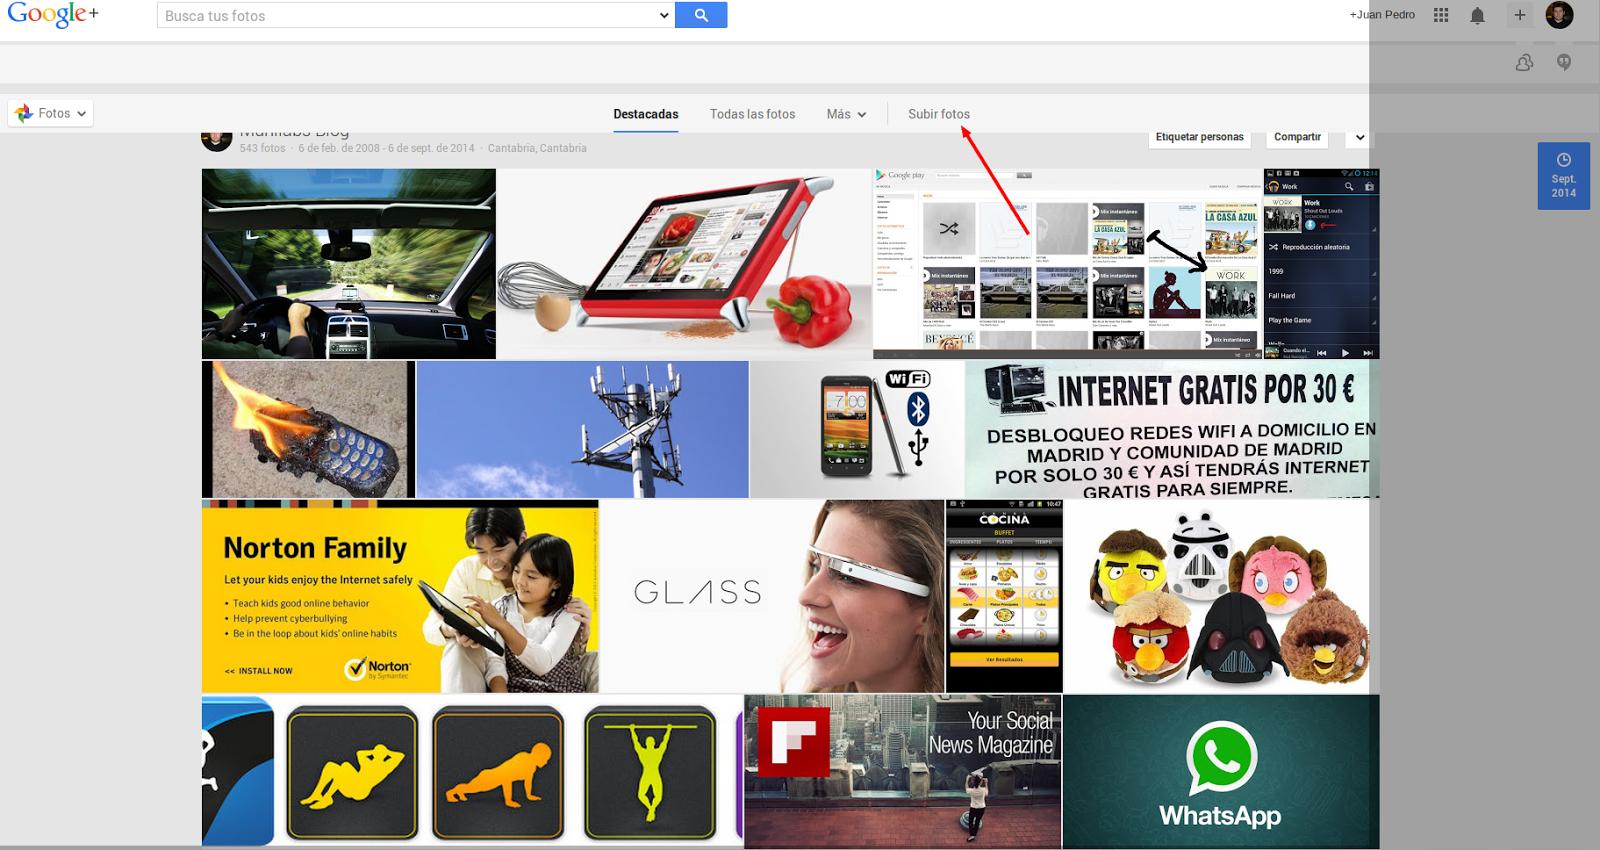 subir fotos google+